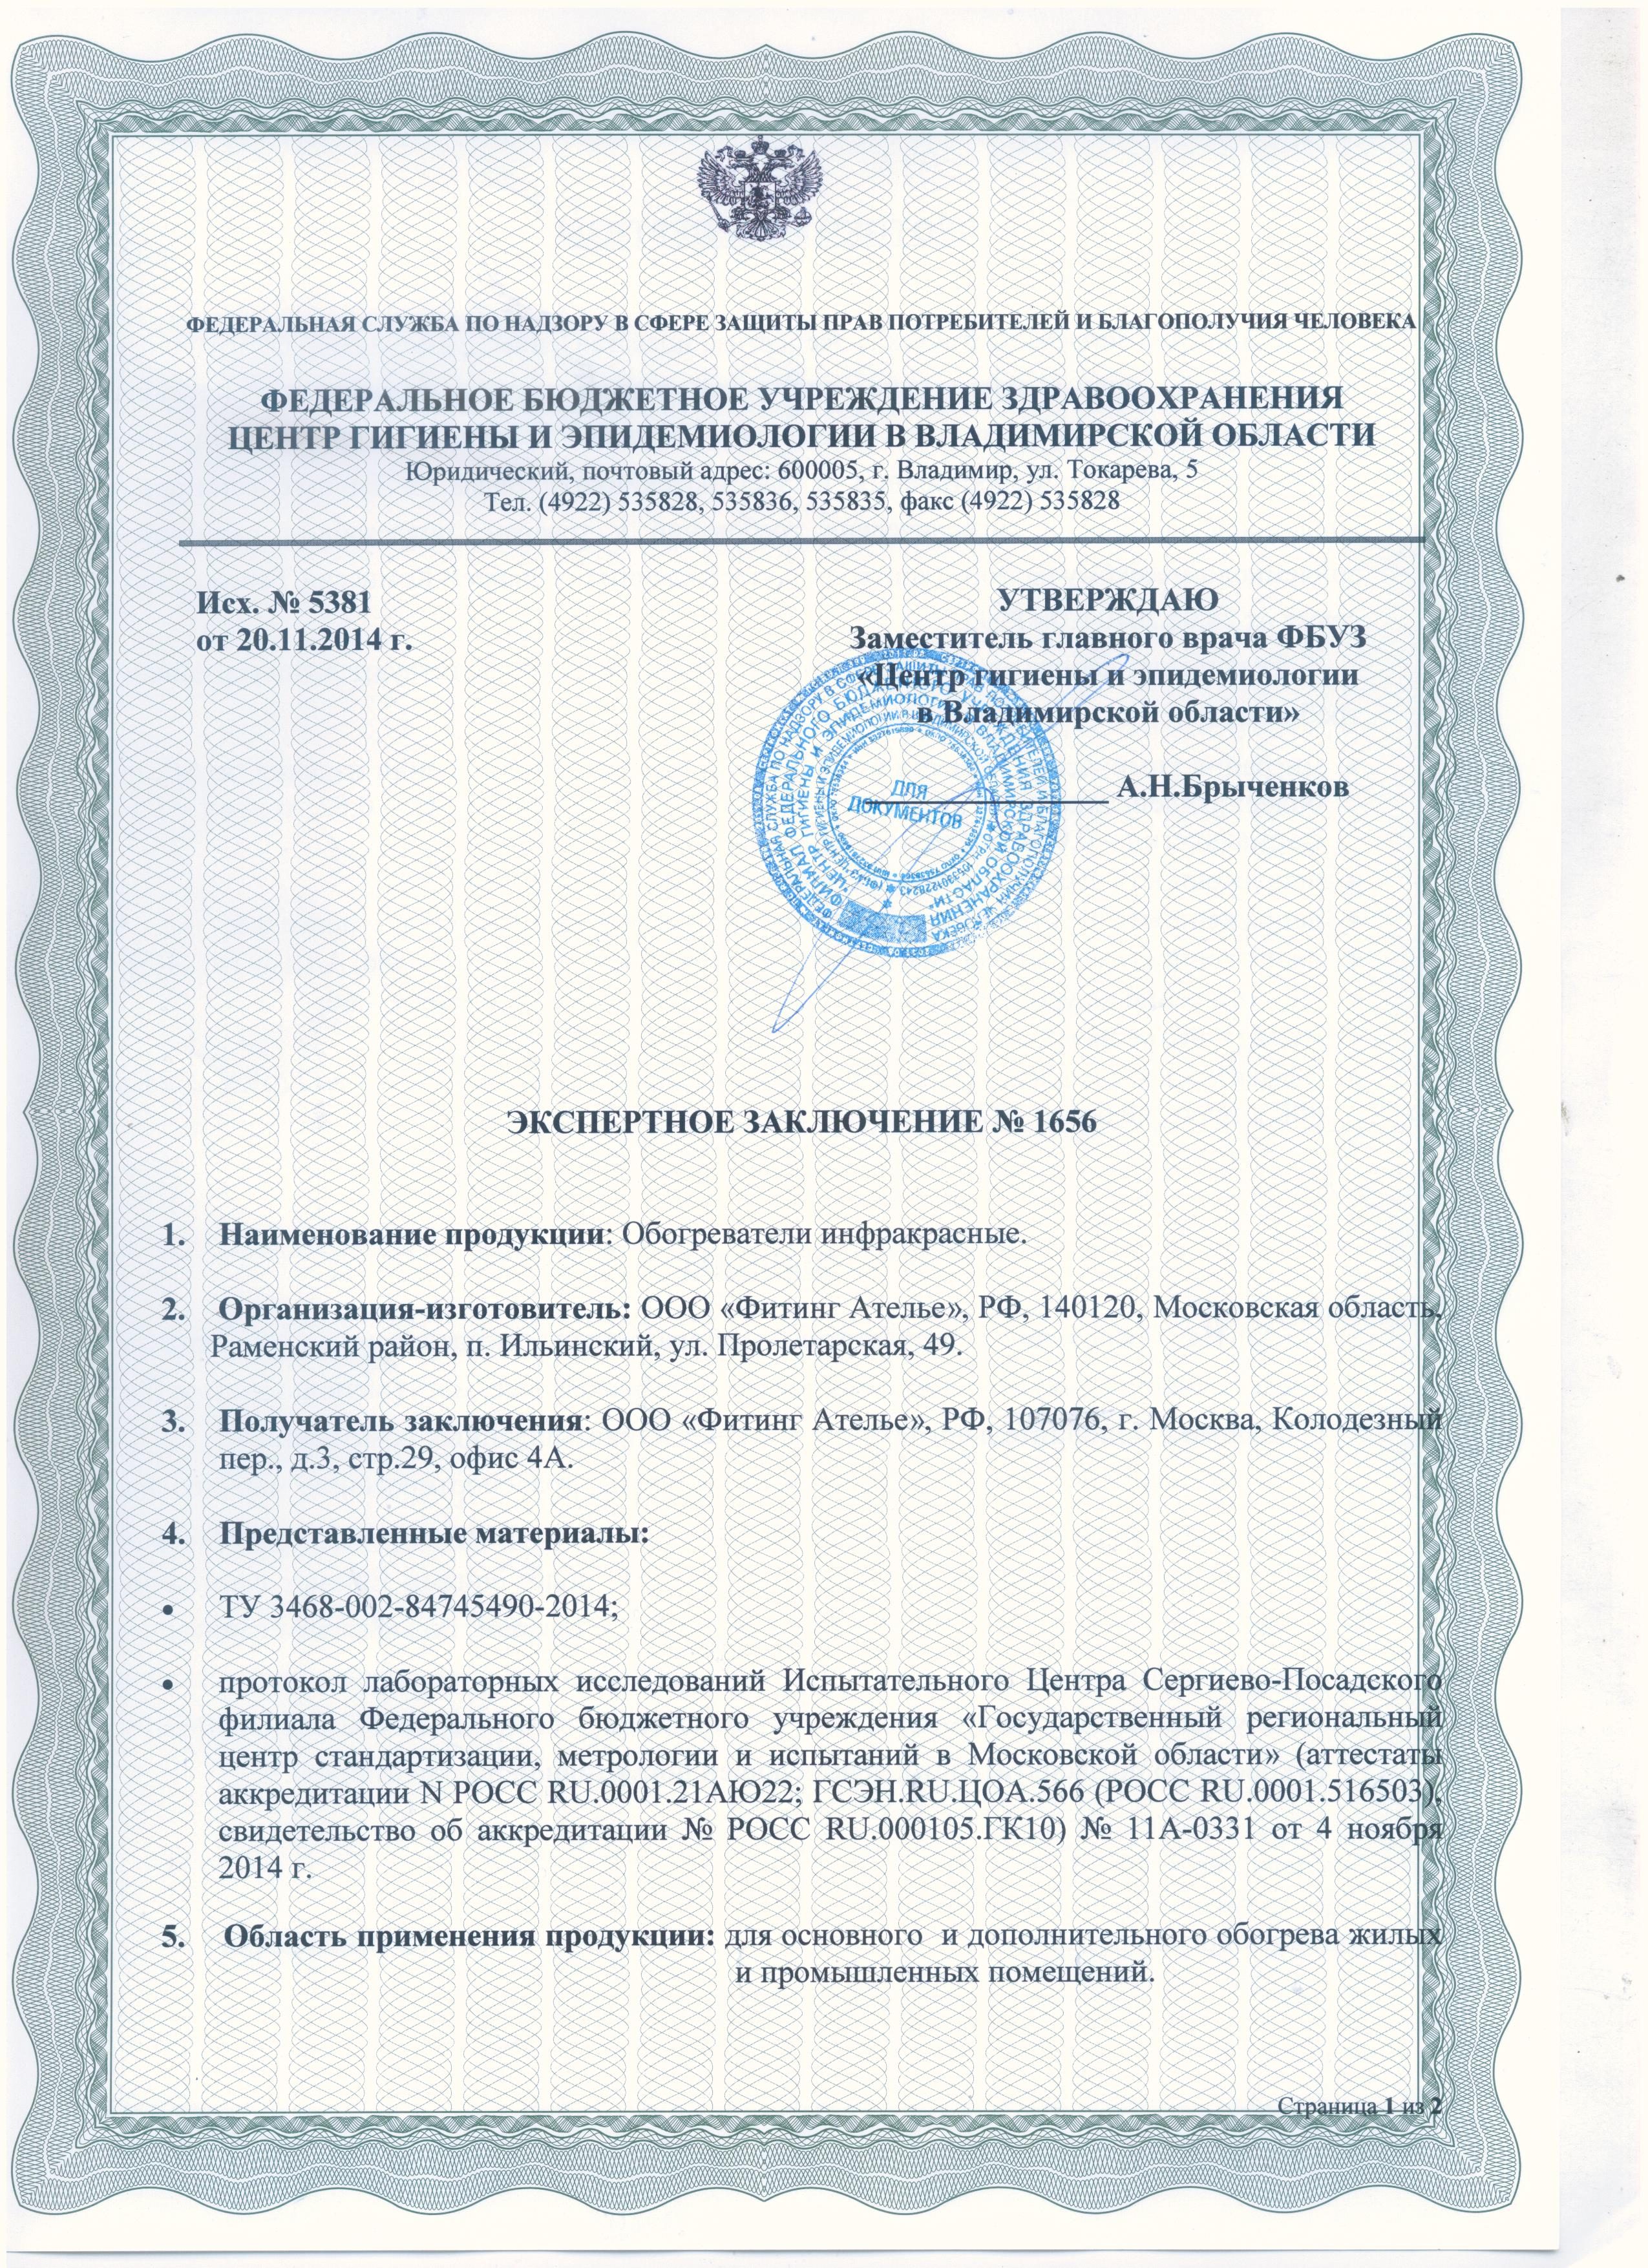 Санитарно-эпидемиологическое заключение на обогреватели ПИОН